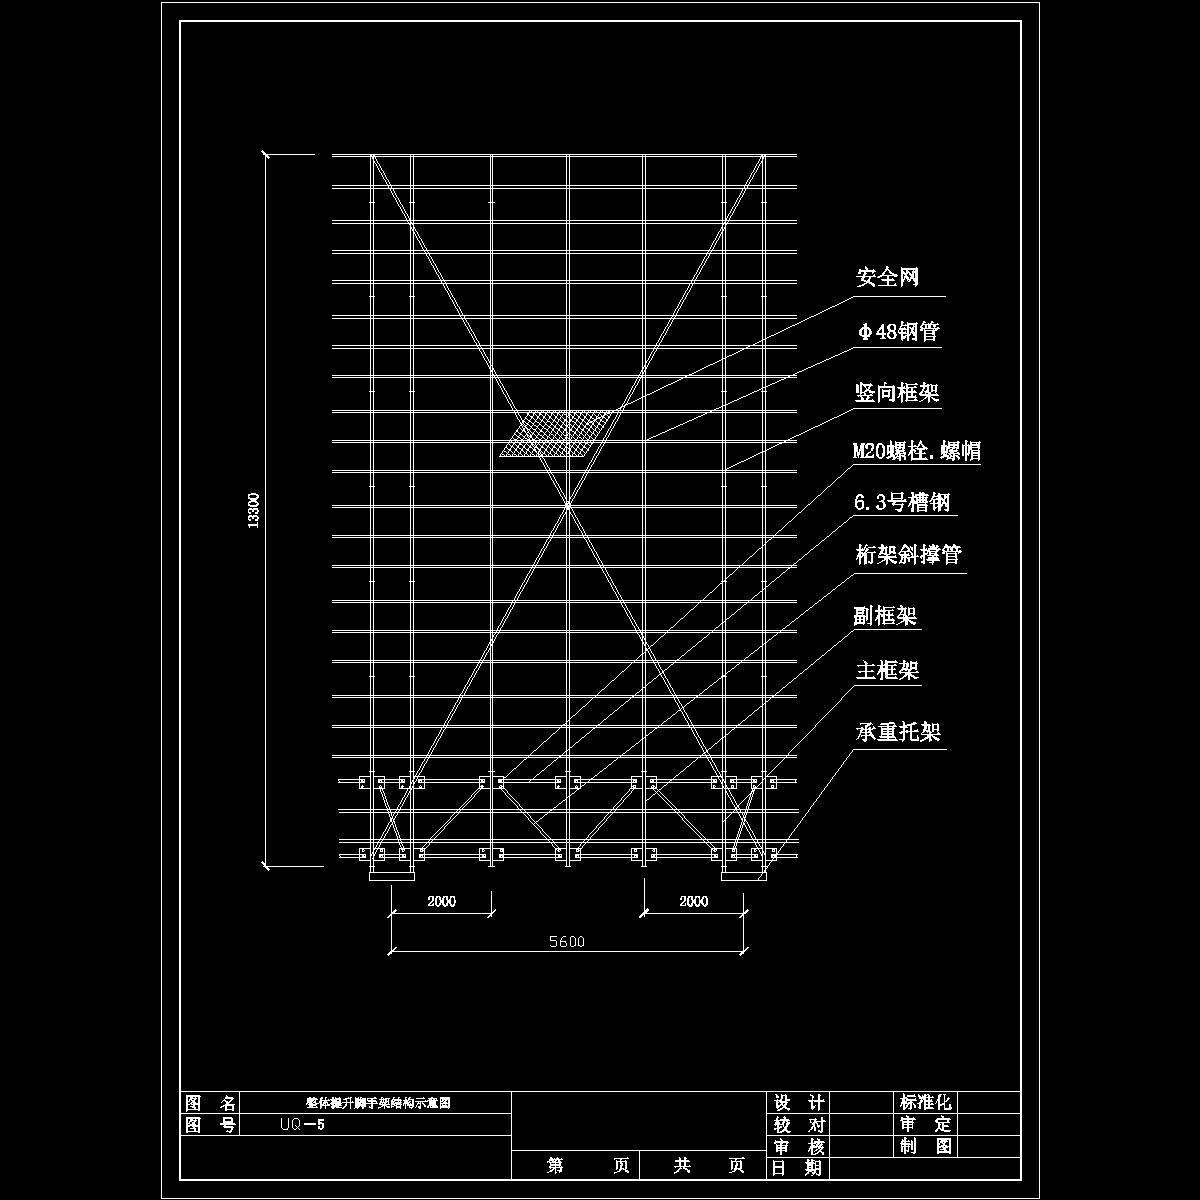 uq-5架体结构图.dwg